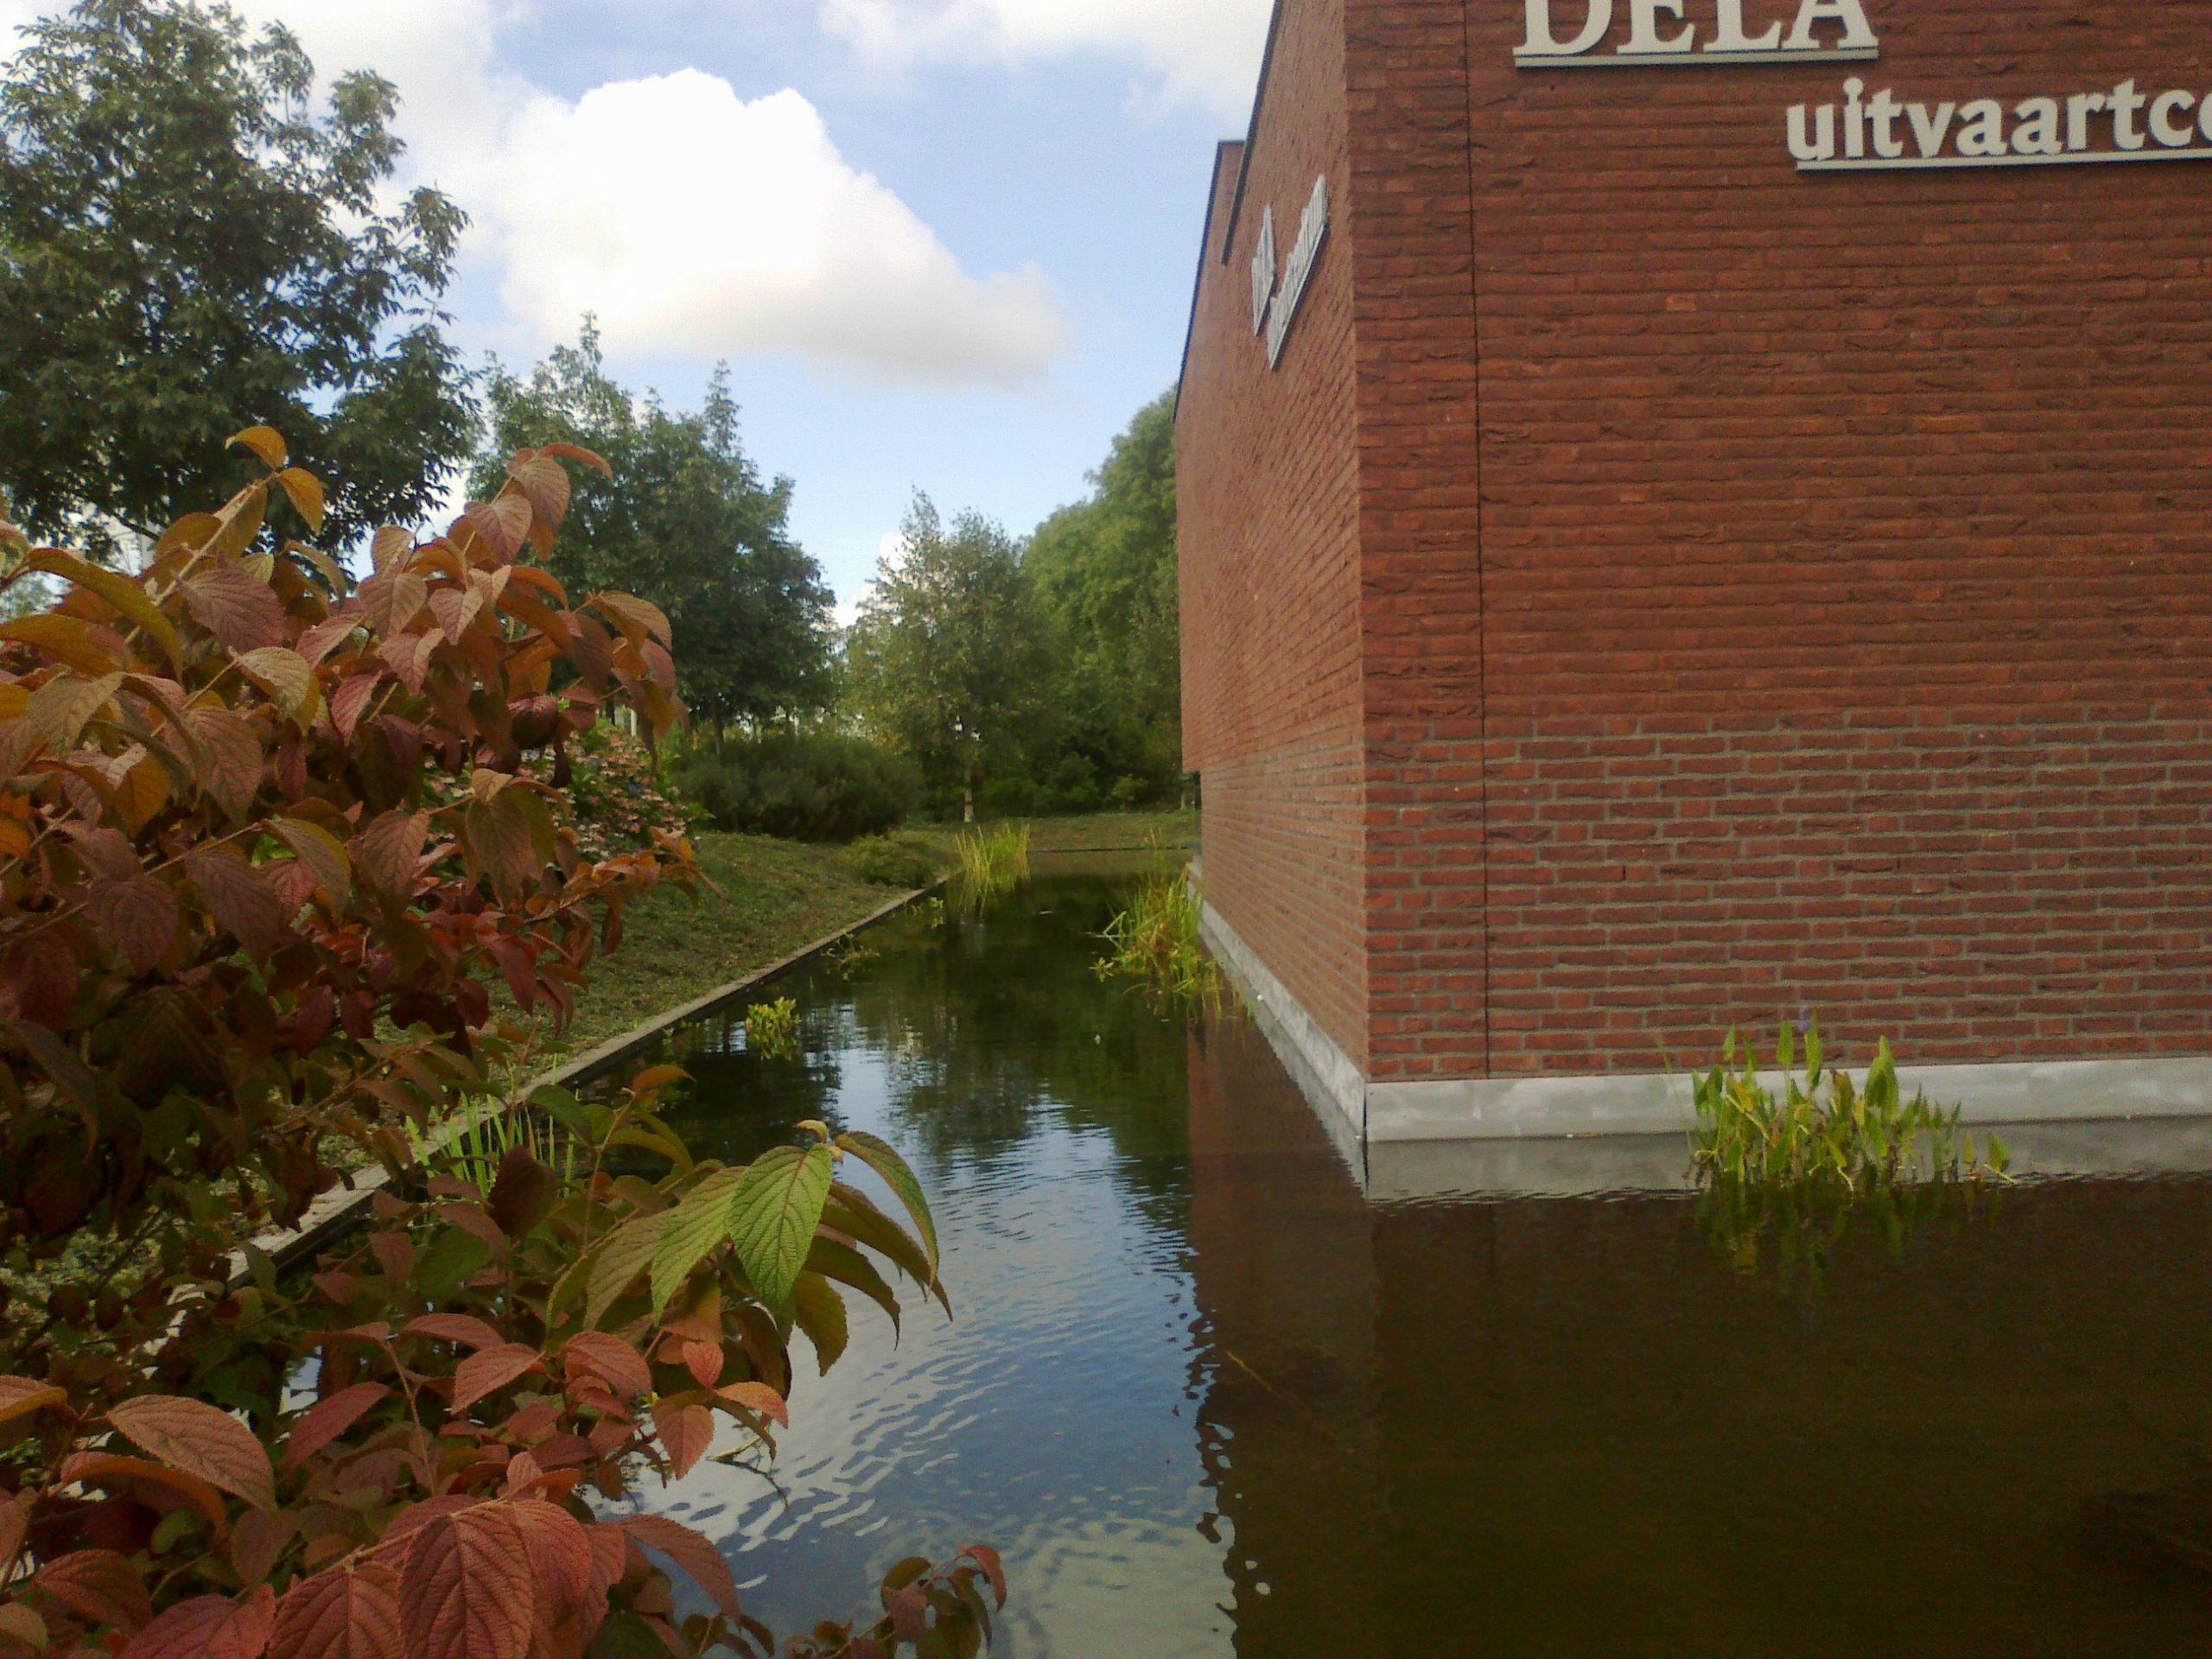 Renovatie DELA-vijver te Breda